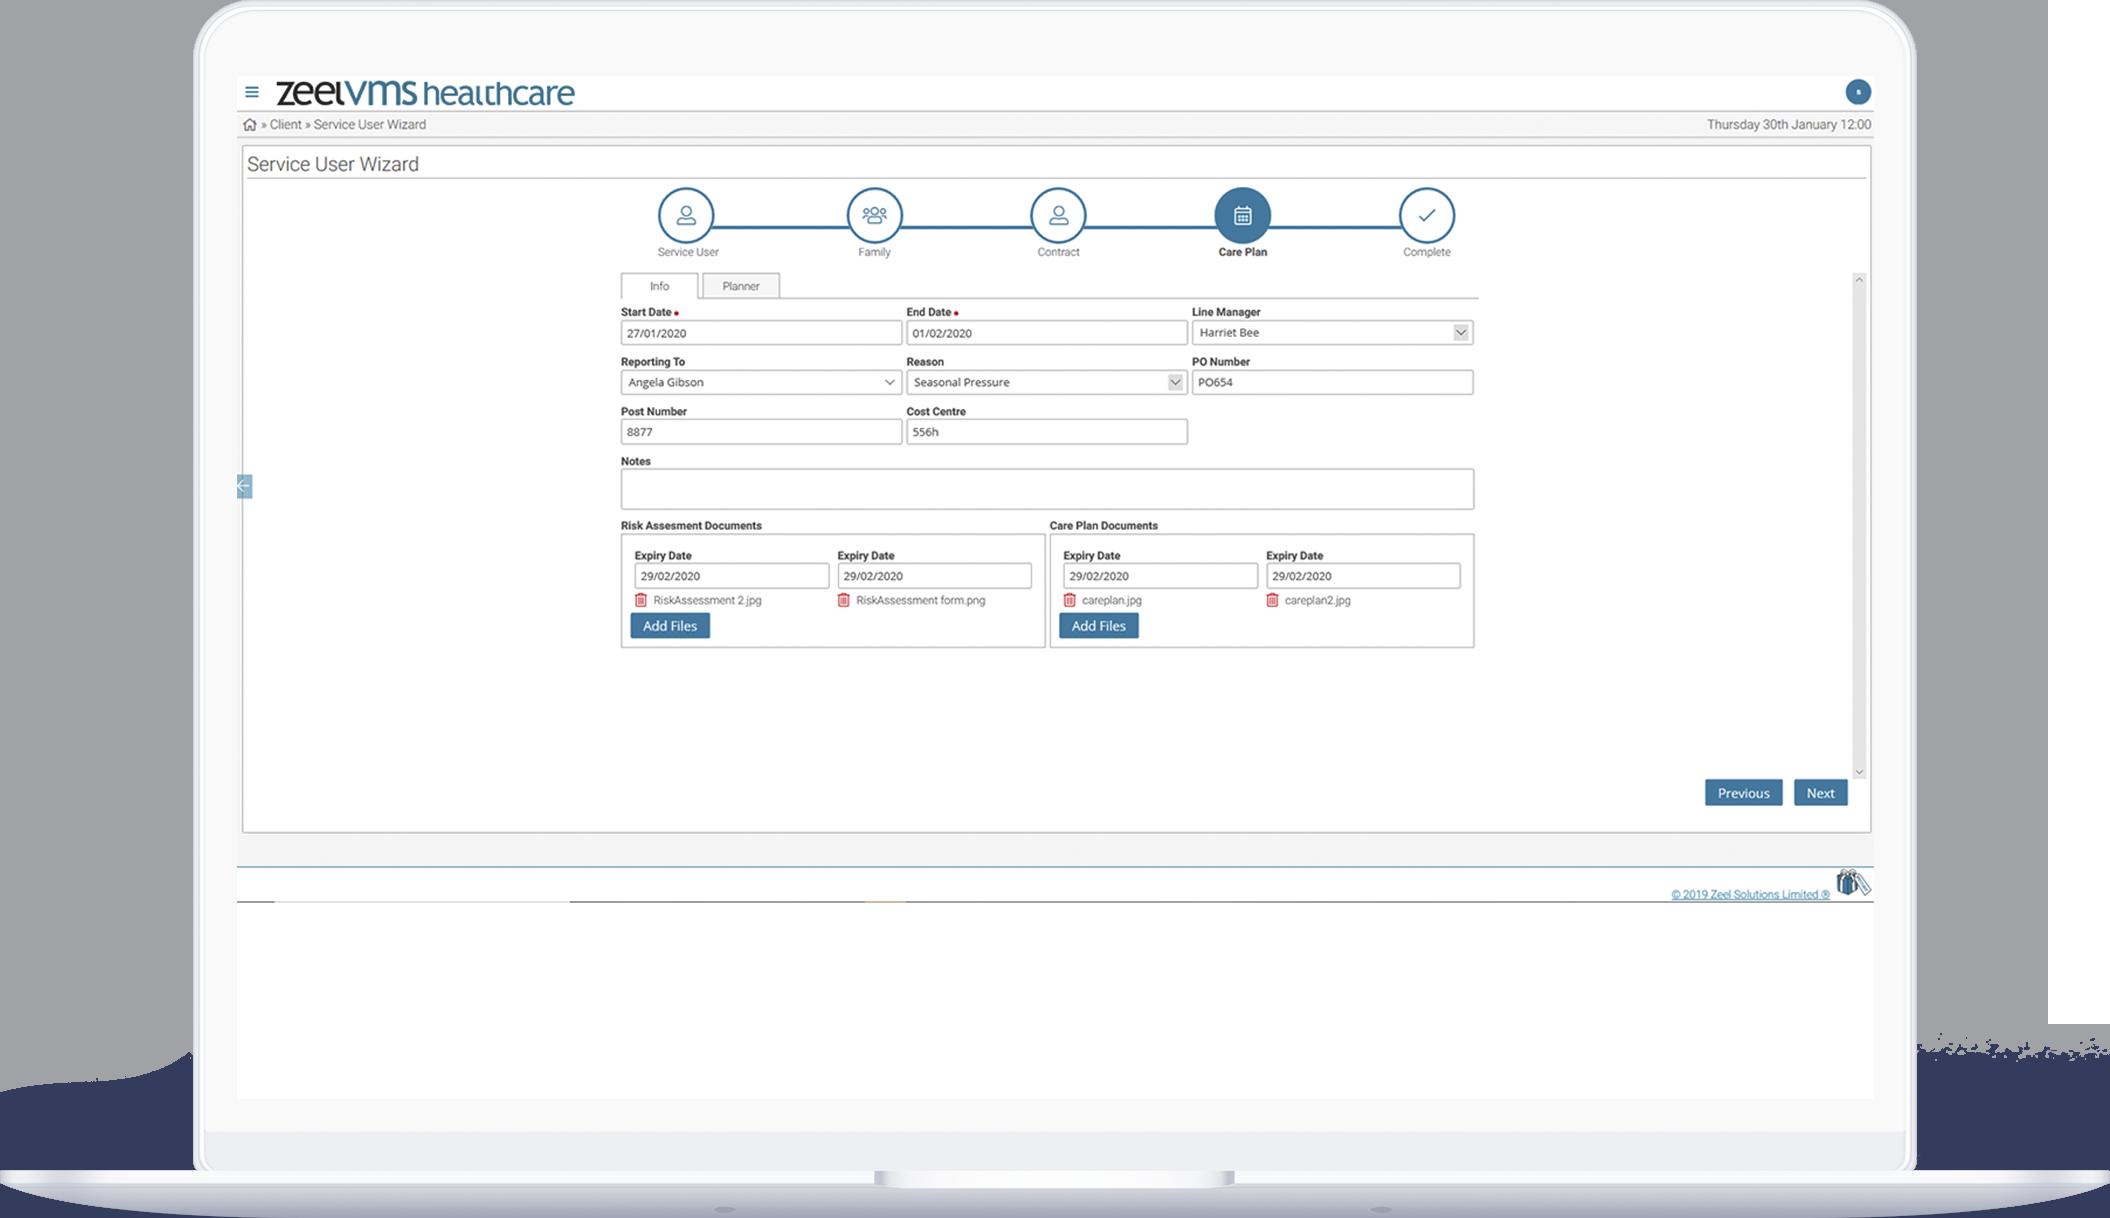 Zeel VMS healthcare service user dashboard